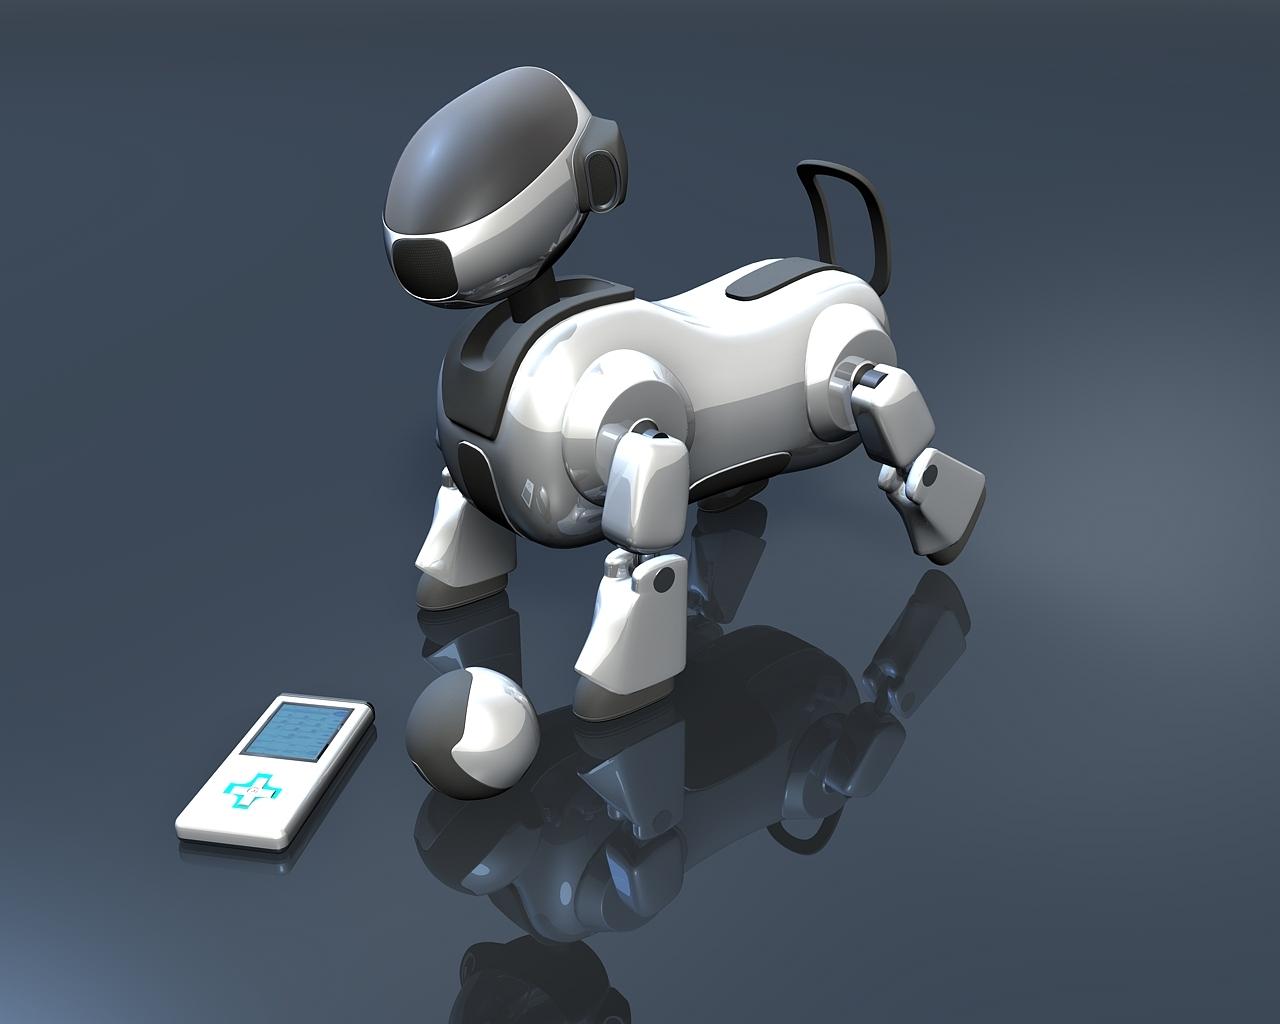 создании роботы картинки на комп раз